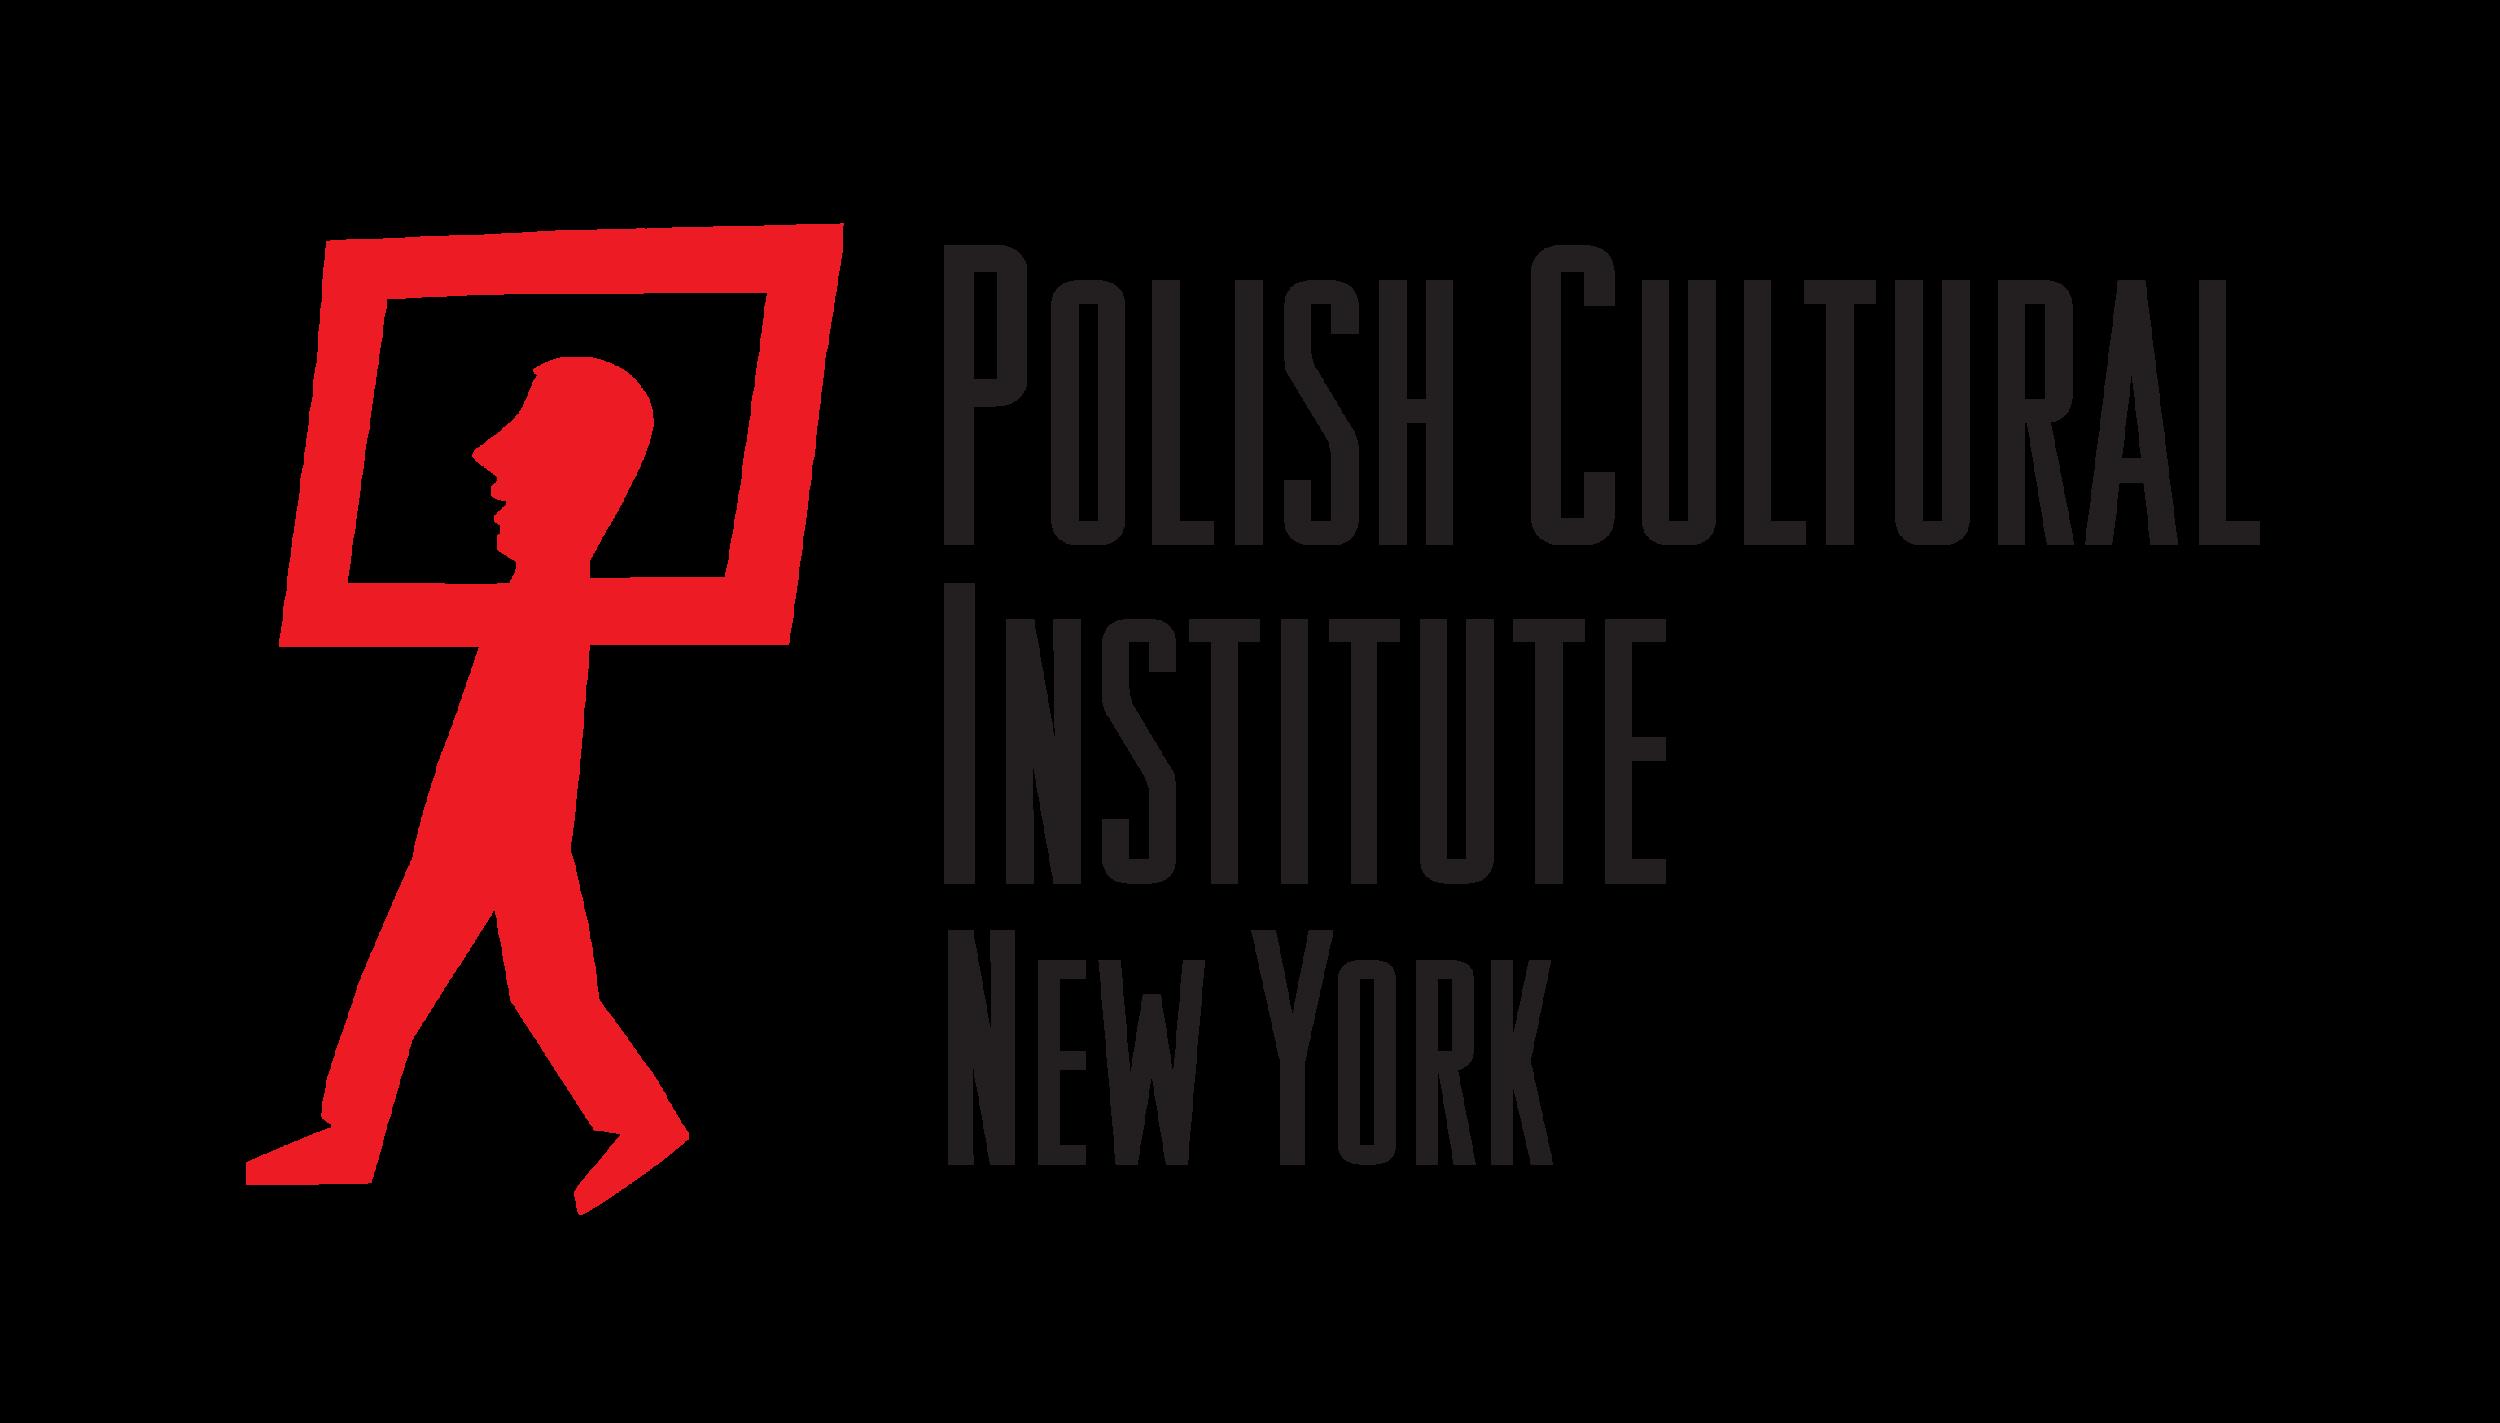 IKP PCI LOGO NEW YORK city_onwhite_eng.png